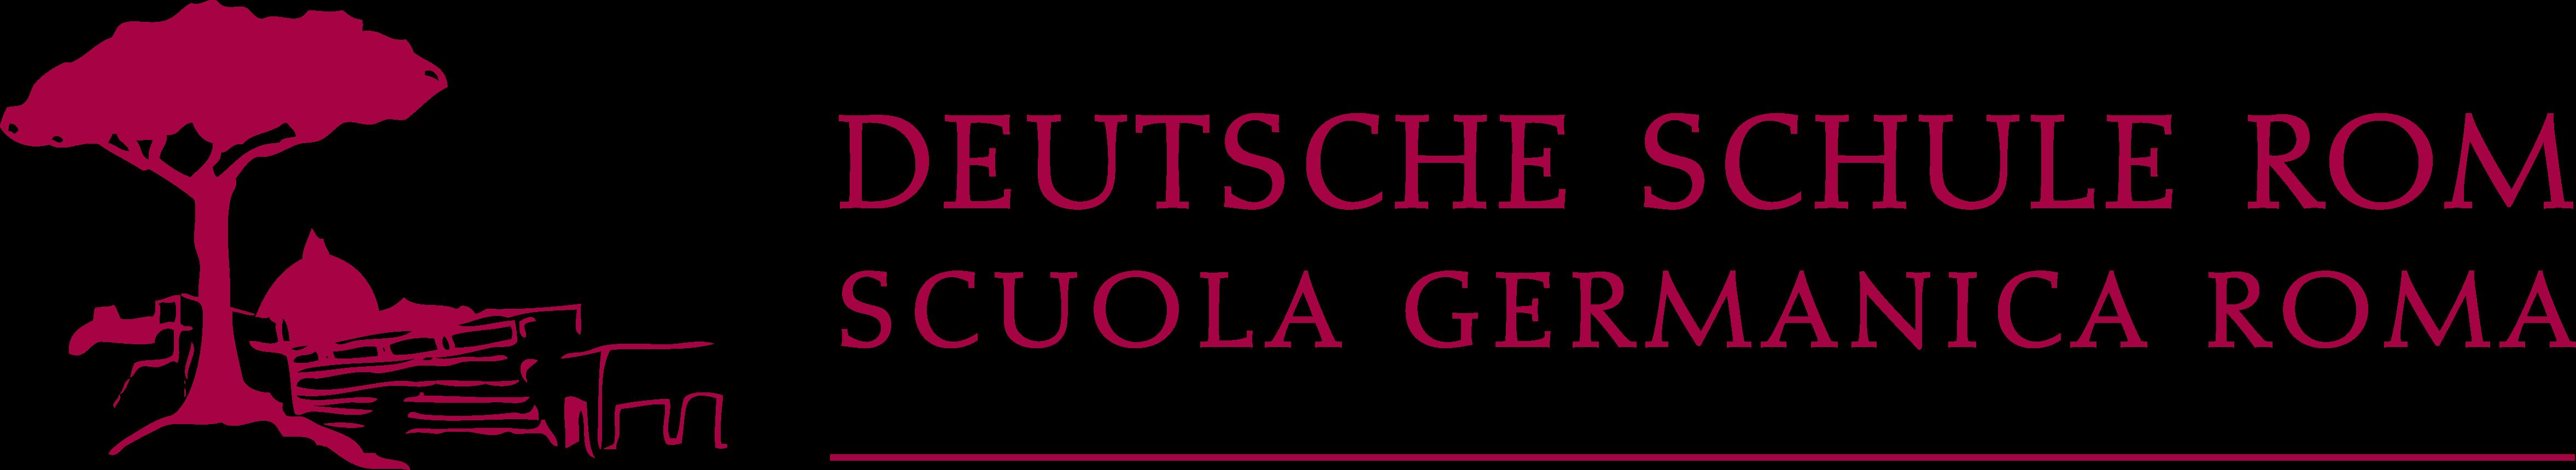 deutsche_schule_rom_logo